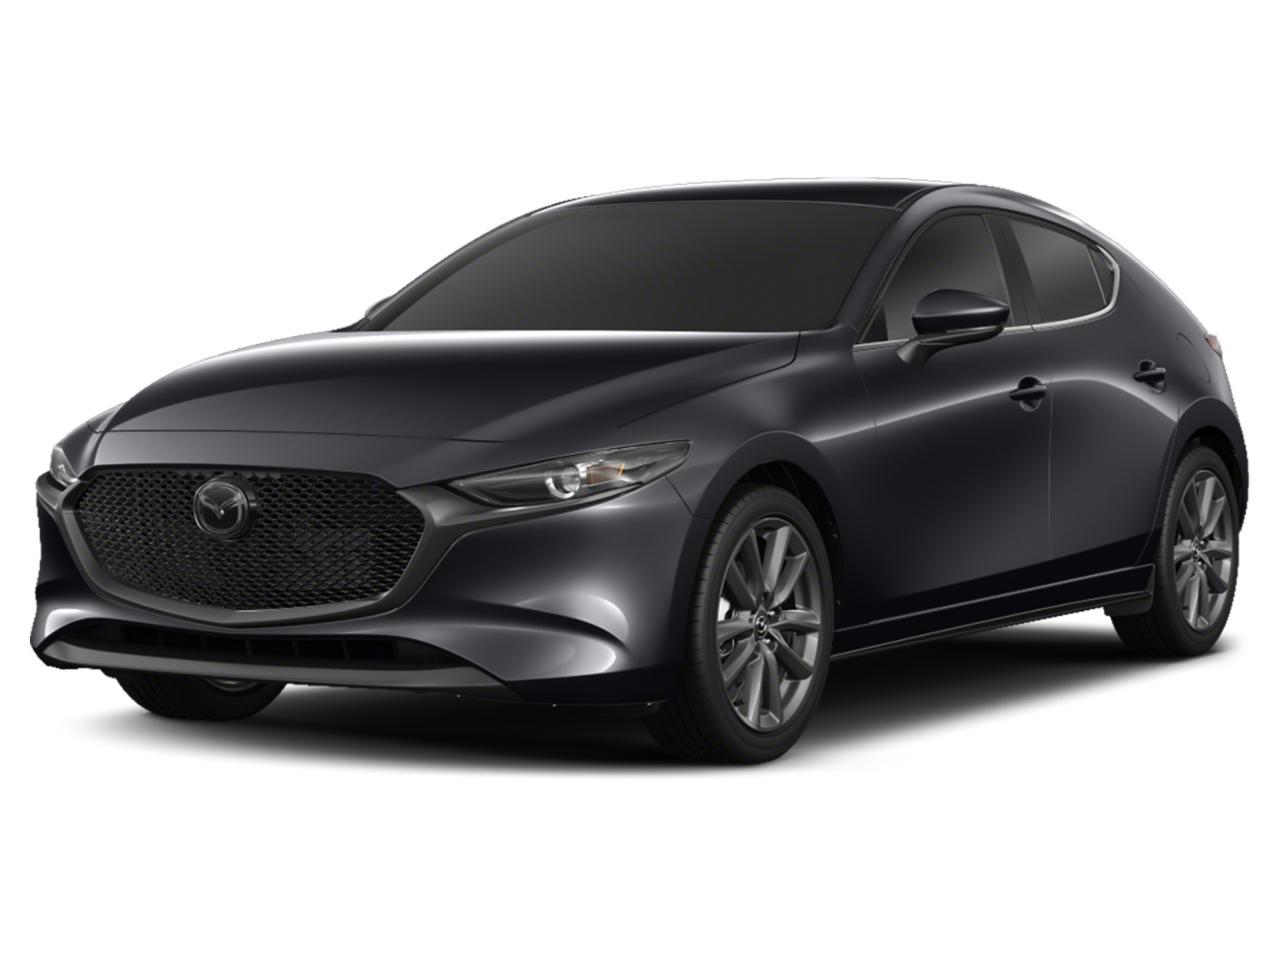 2021 Mazda Mazda3 Hatchback Vehicle Photo in Green Bay, WI 54304